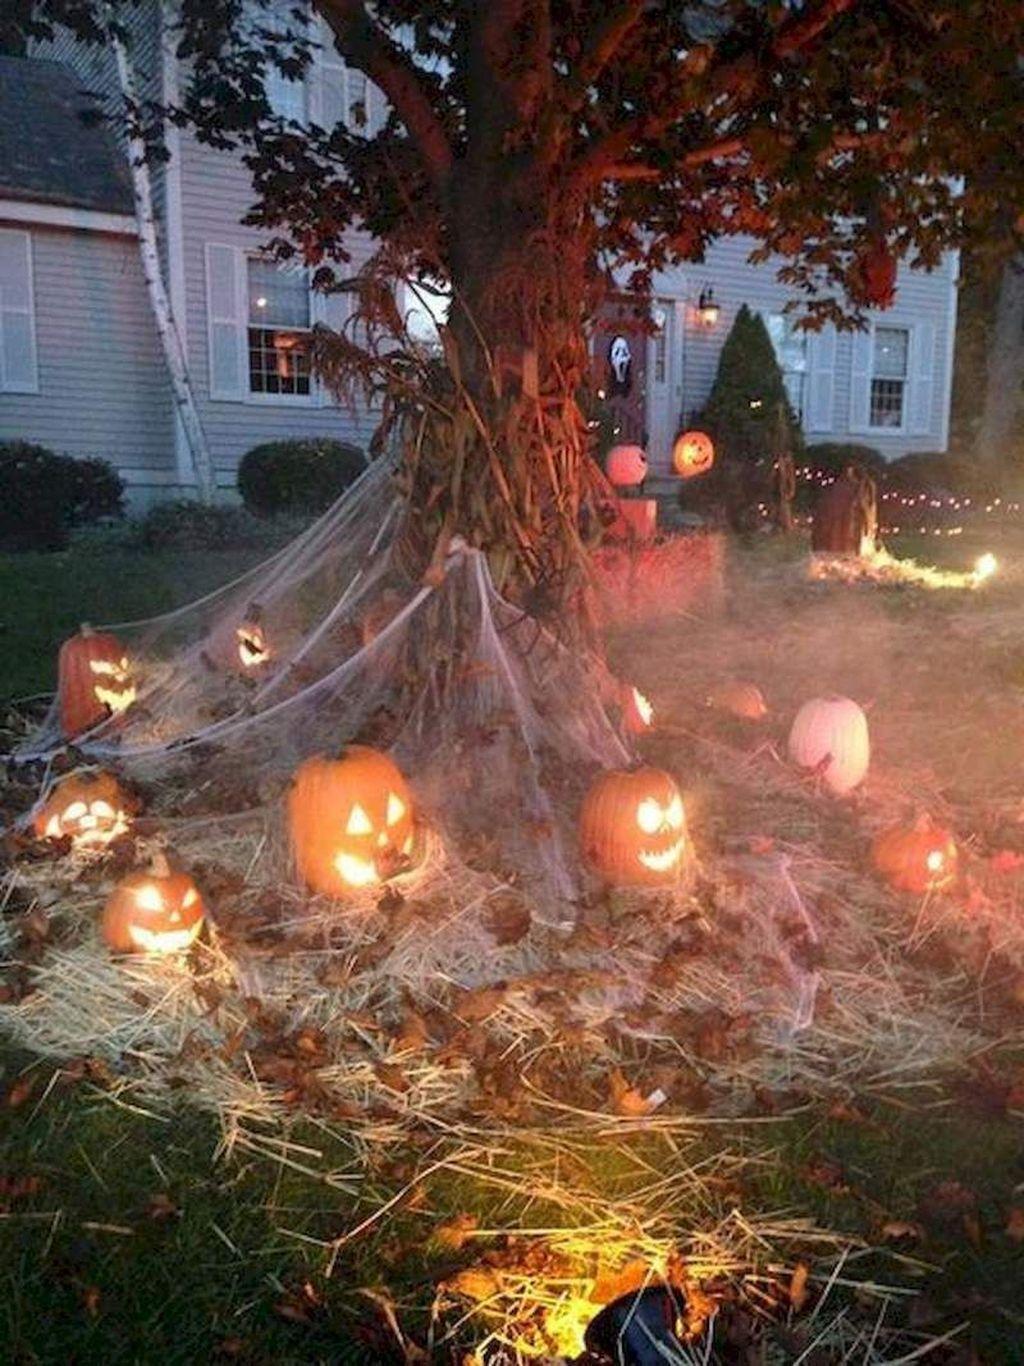 32 Fabulous Halloween Outdoor Decorations Ideas Looks Scary Scary Halloween Decorations Diy Halloween Outdoor Decorations Halloween Diy Outdoor